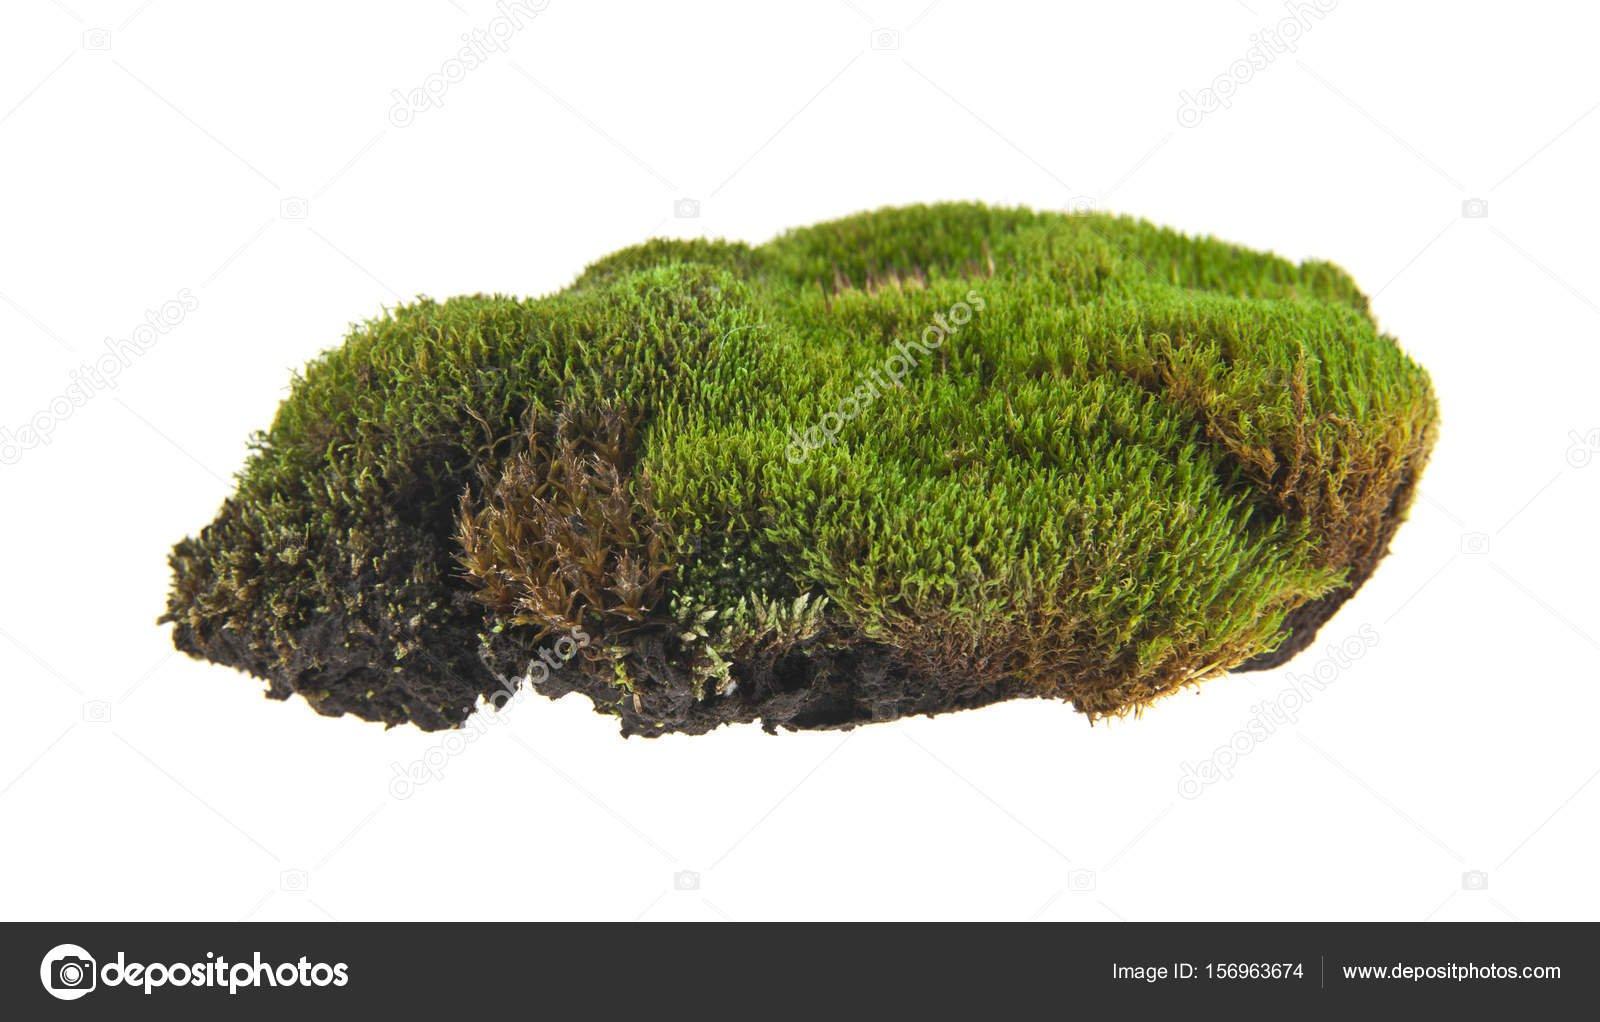 groene mos op witte achtergrond — Stockfoto © valzan #156963674